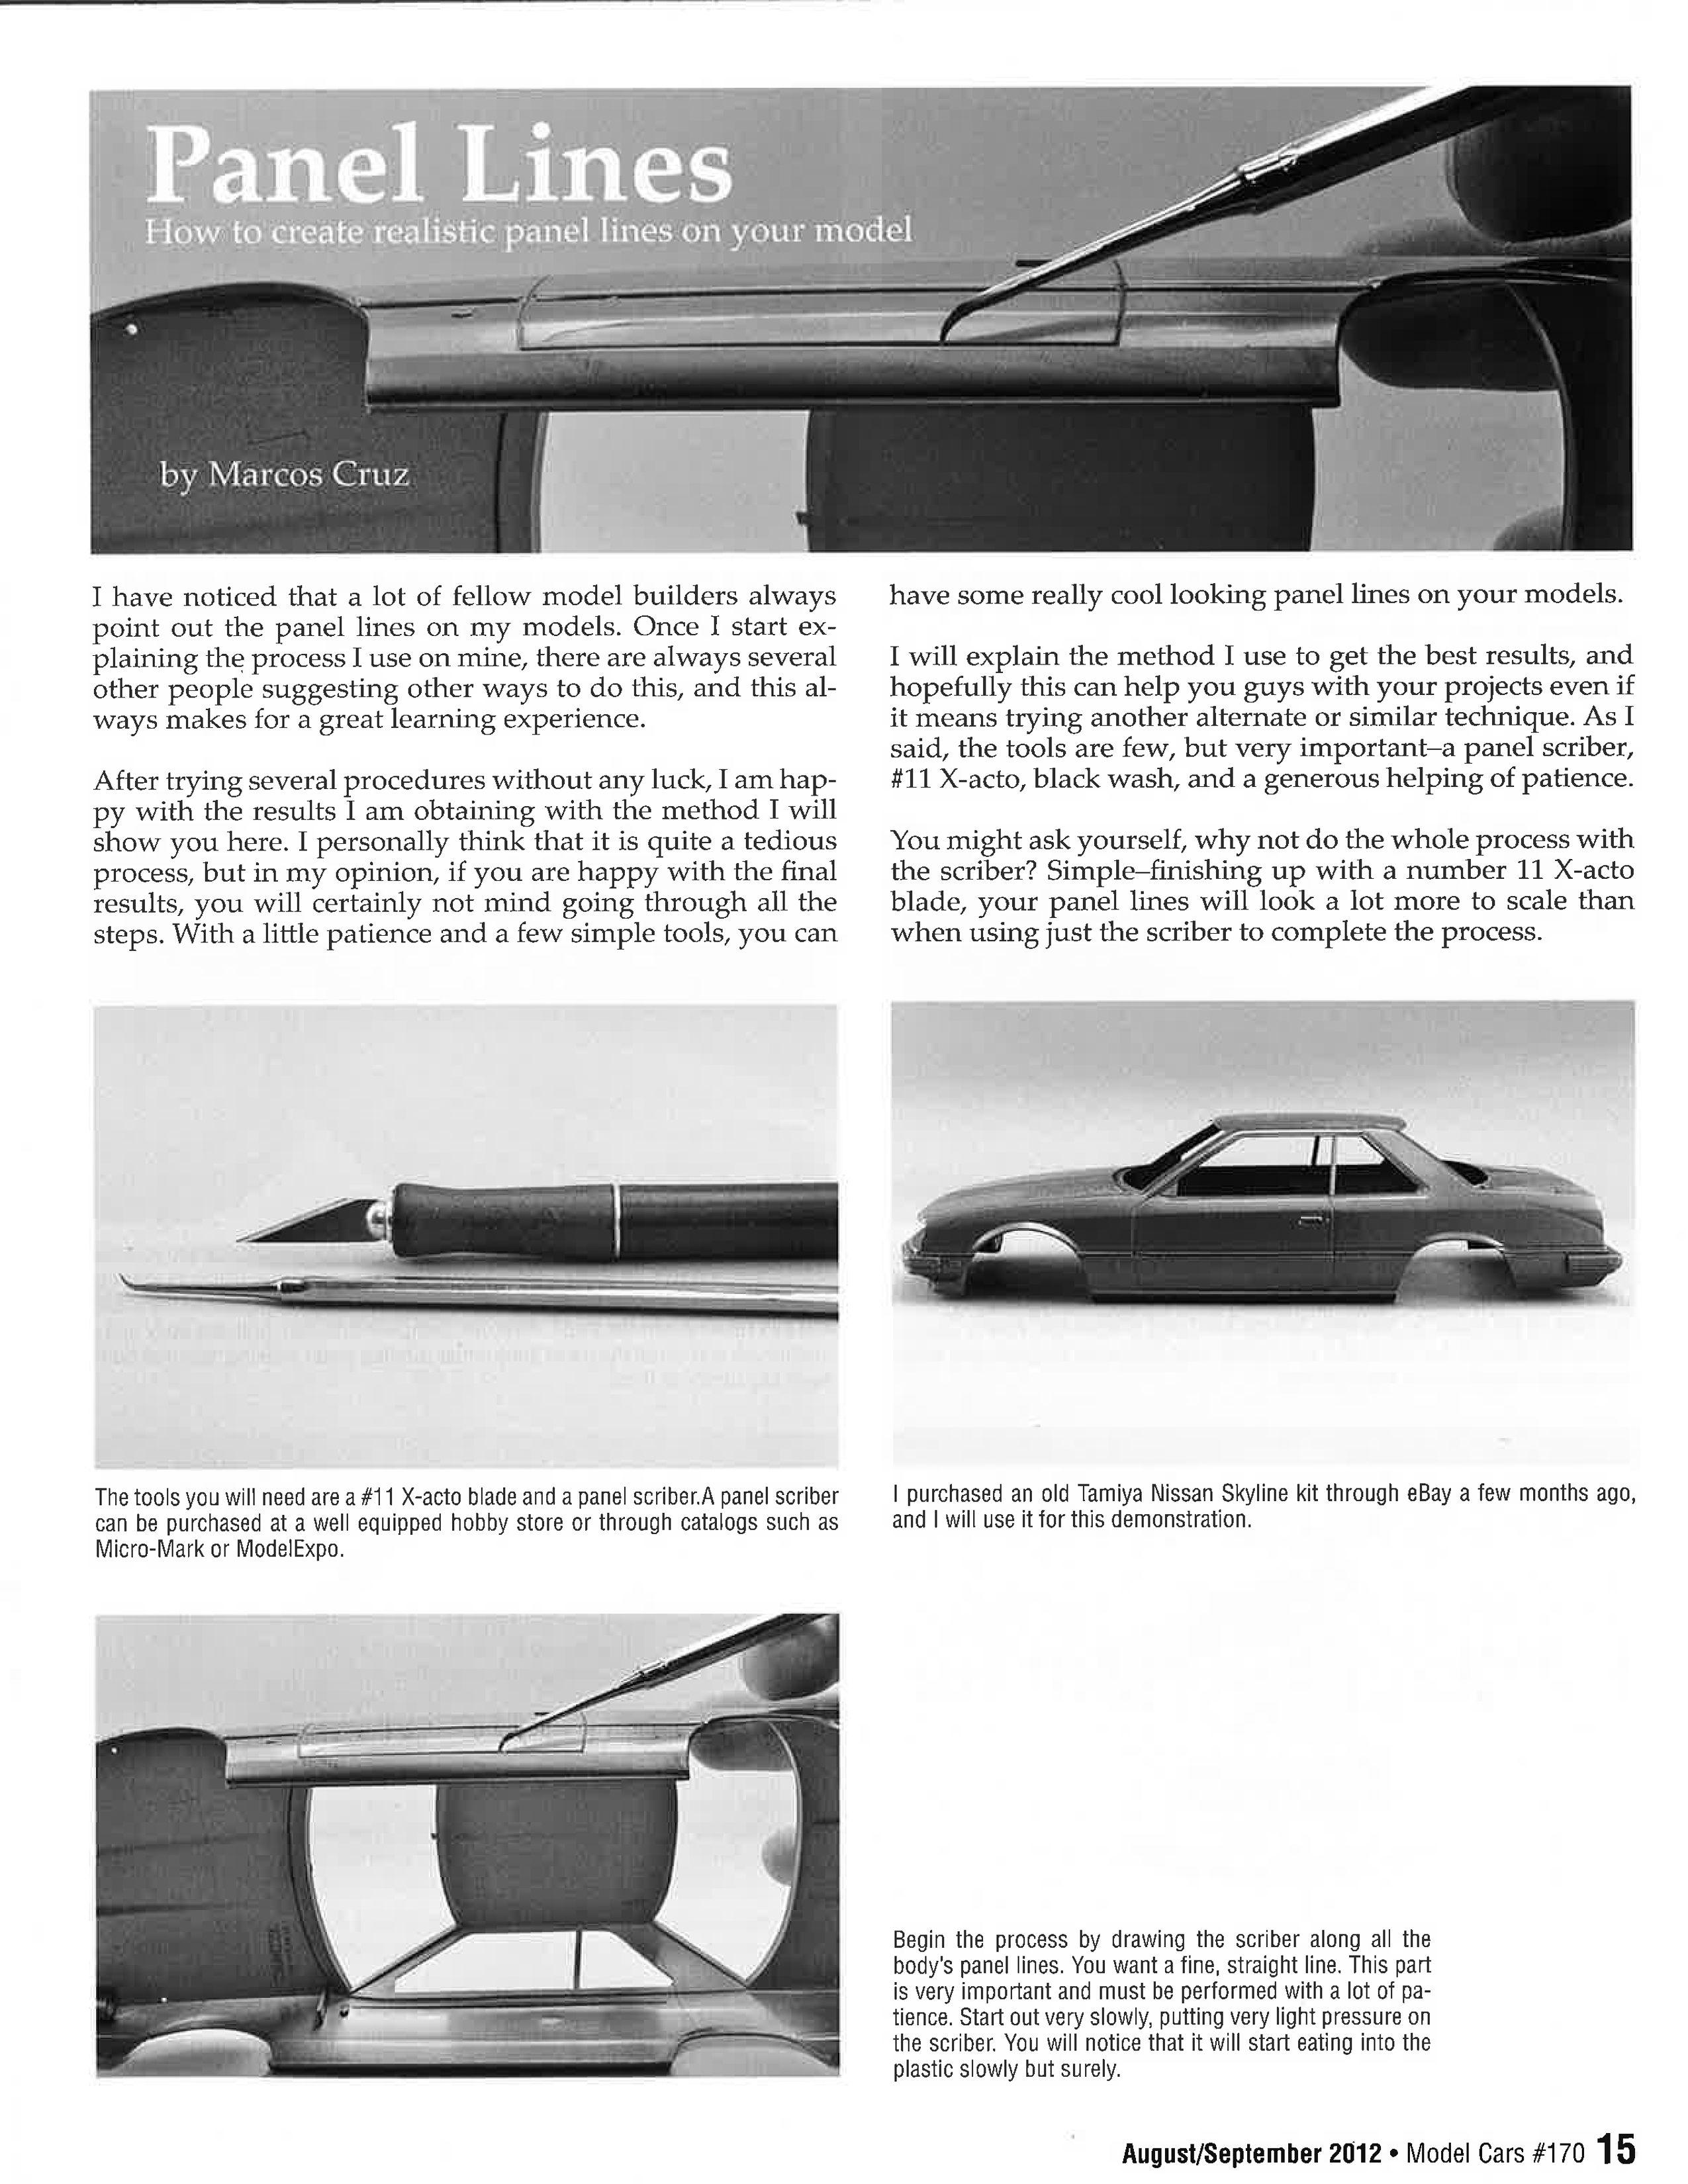 Panel Lines By Marcos Cruz Scaledworld Paneling Car Model Cruz